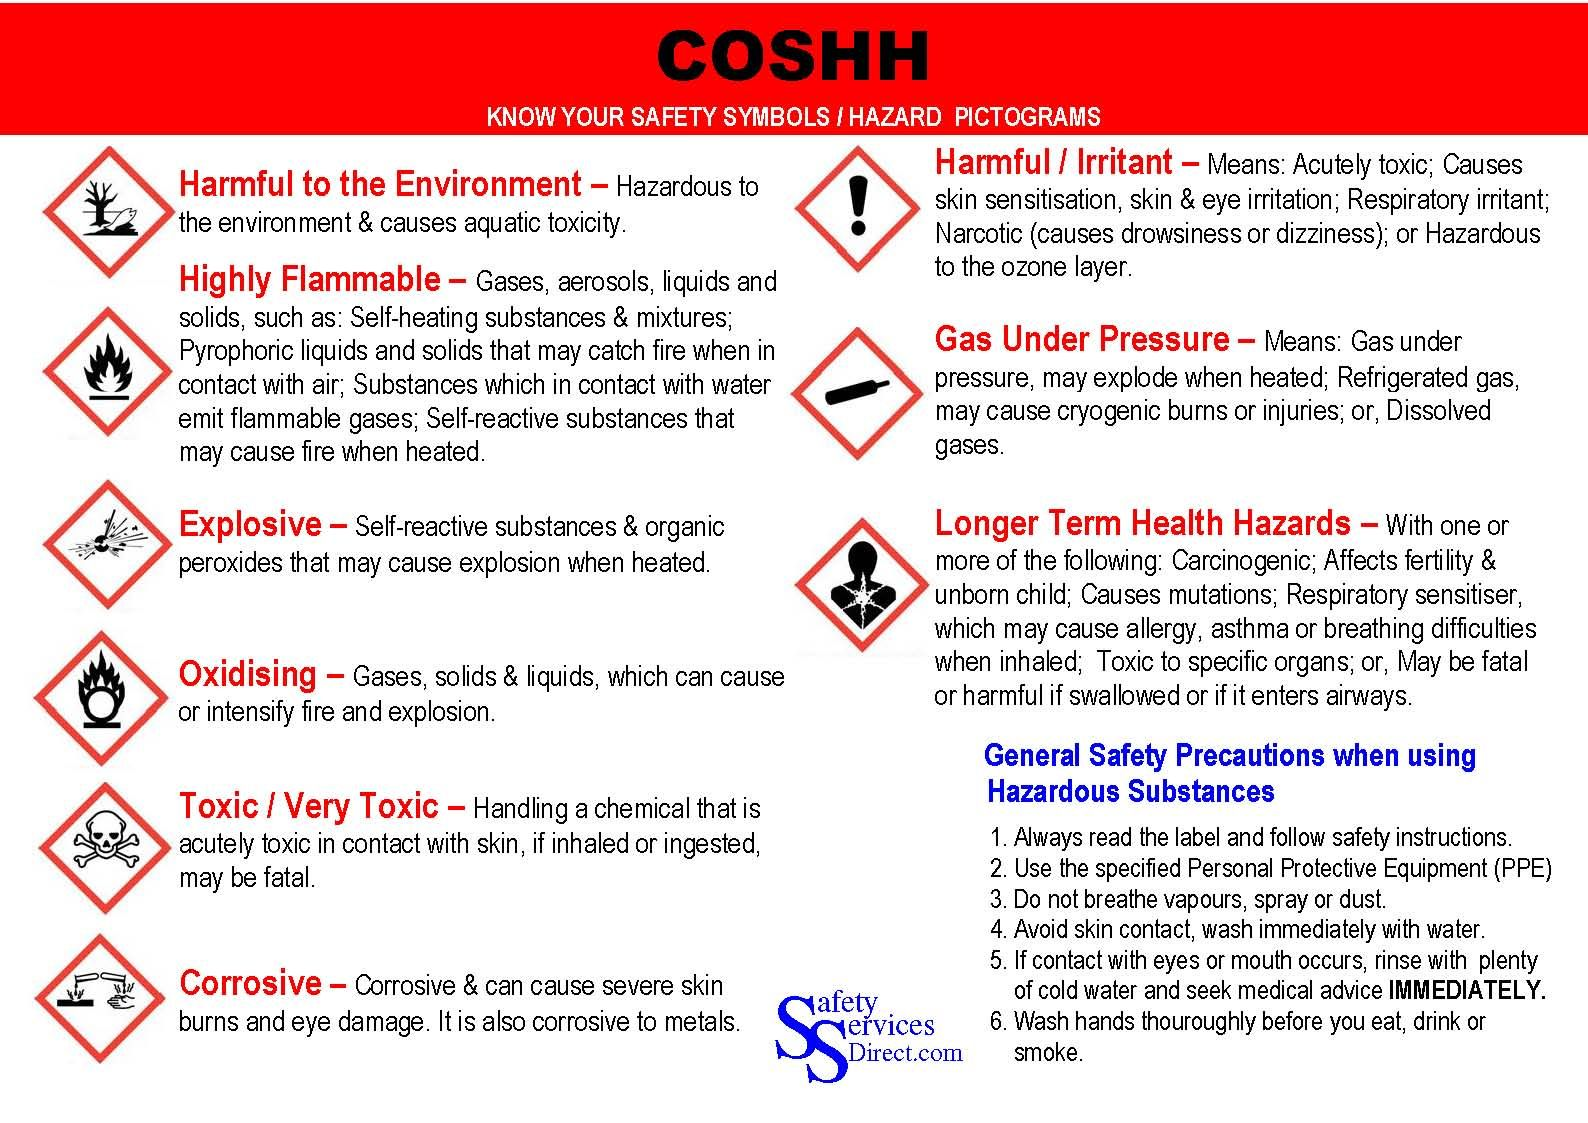 New Coshh Symbols X28 Hazard Pictogram X29 Poster P